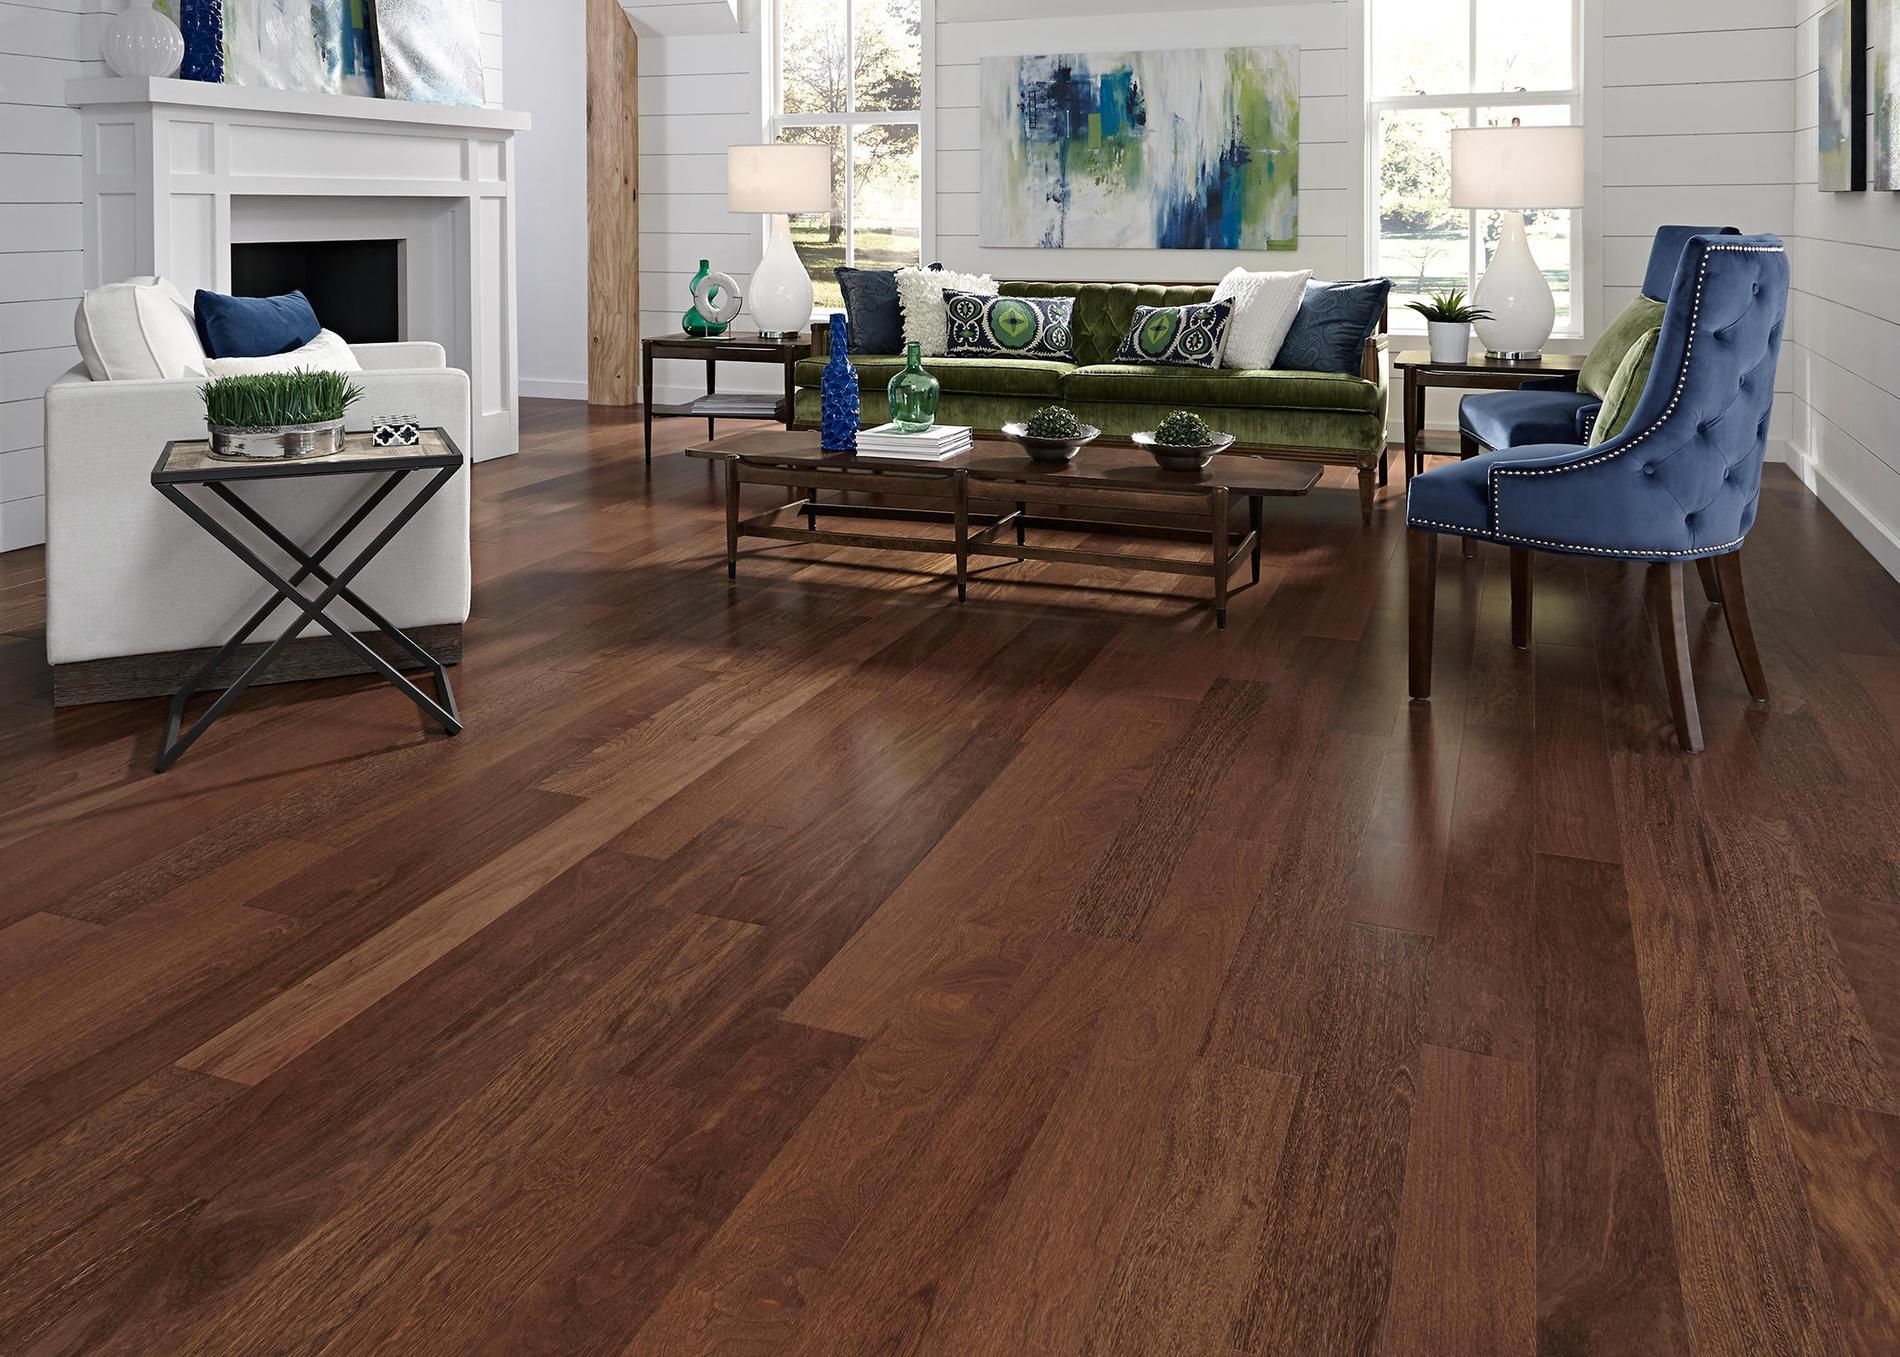 Ll Flooring Lumber Liquidators 1073, Laminate Flooring Baton Rouge